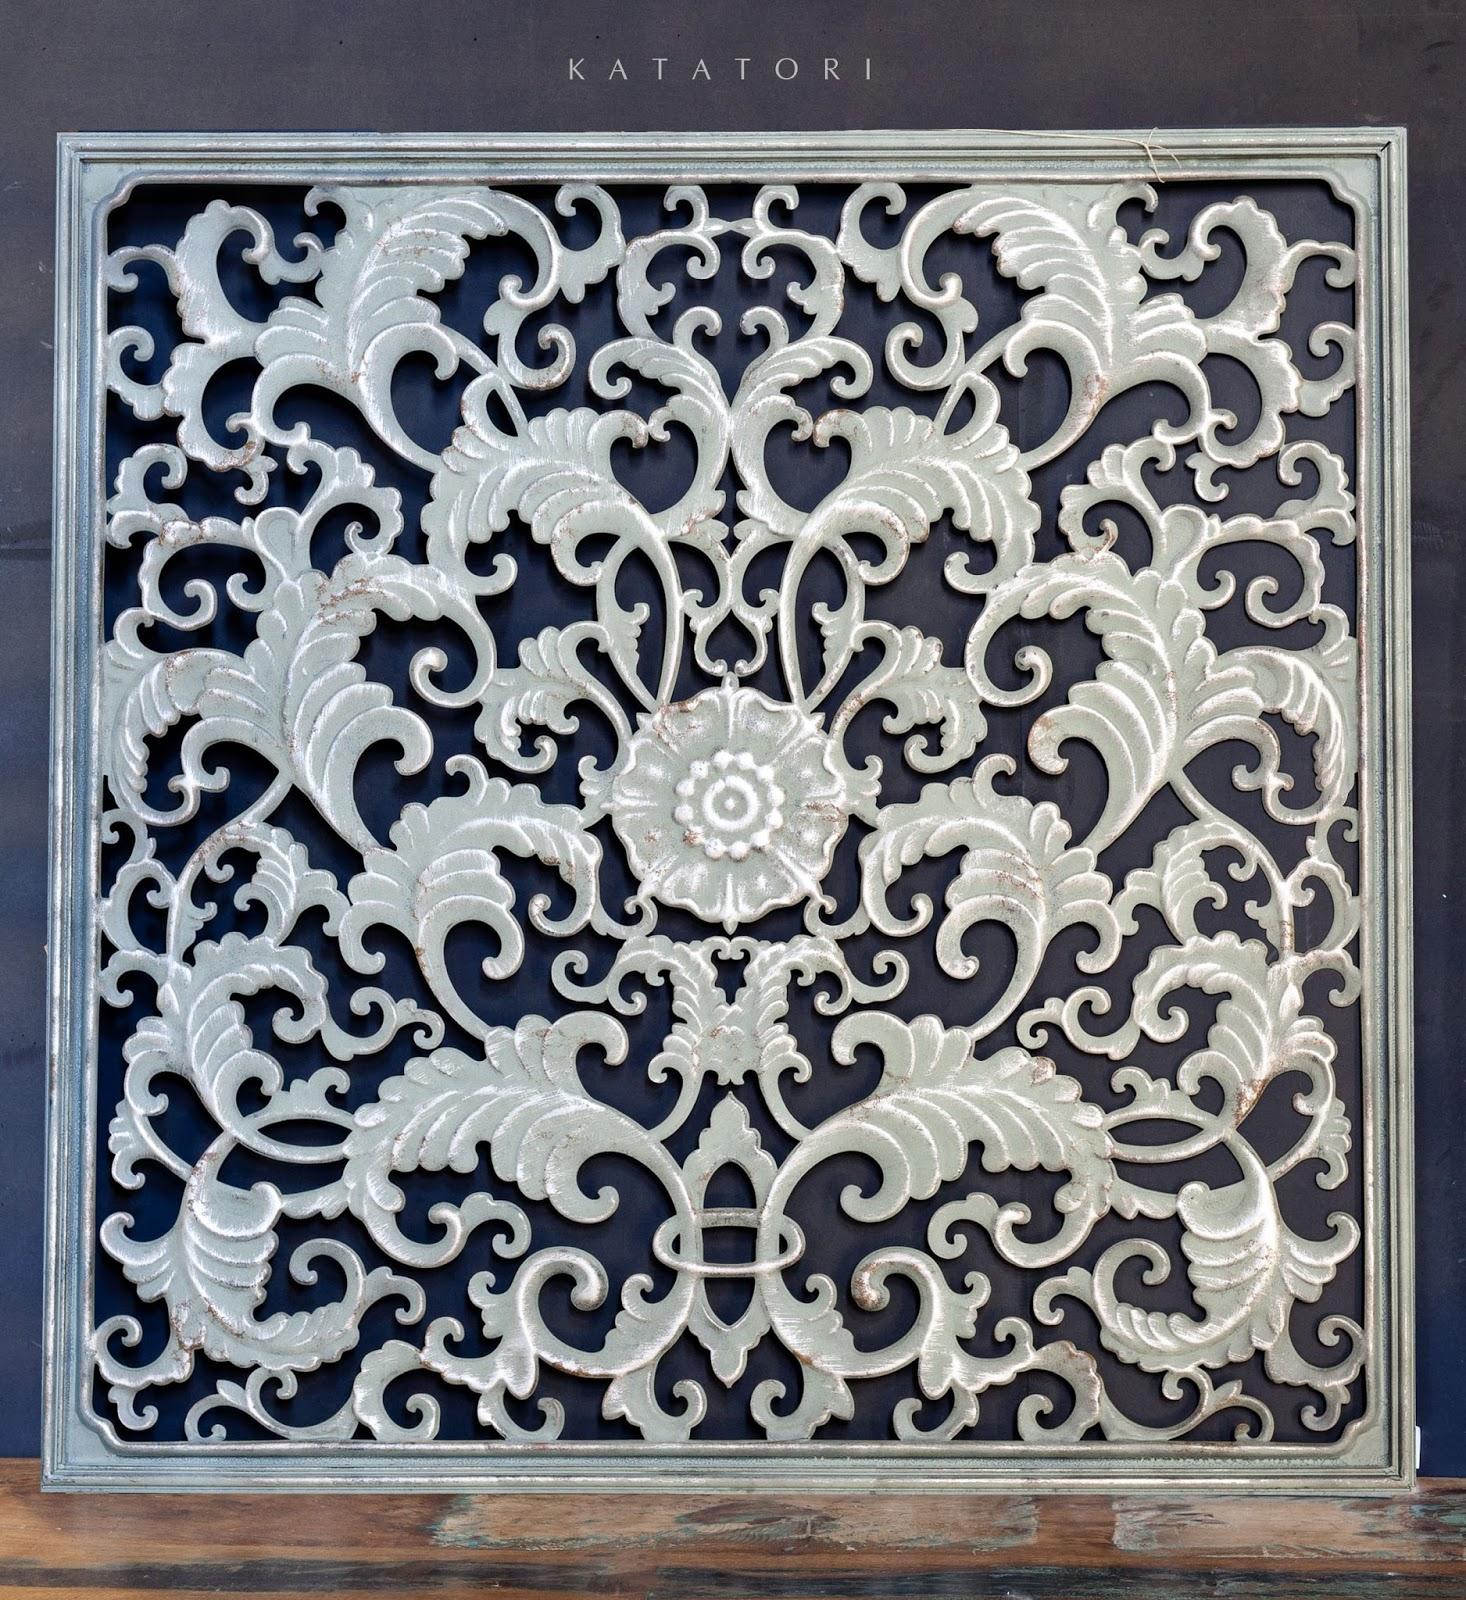 Katatori interiores cuadros de metal for Cuadros de interiores